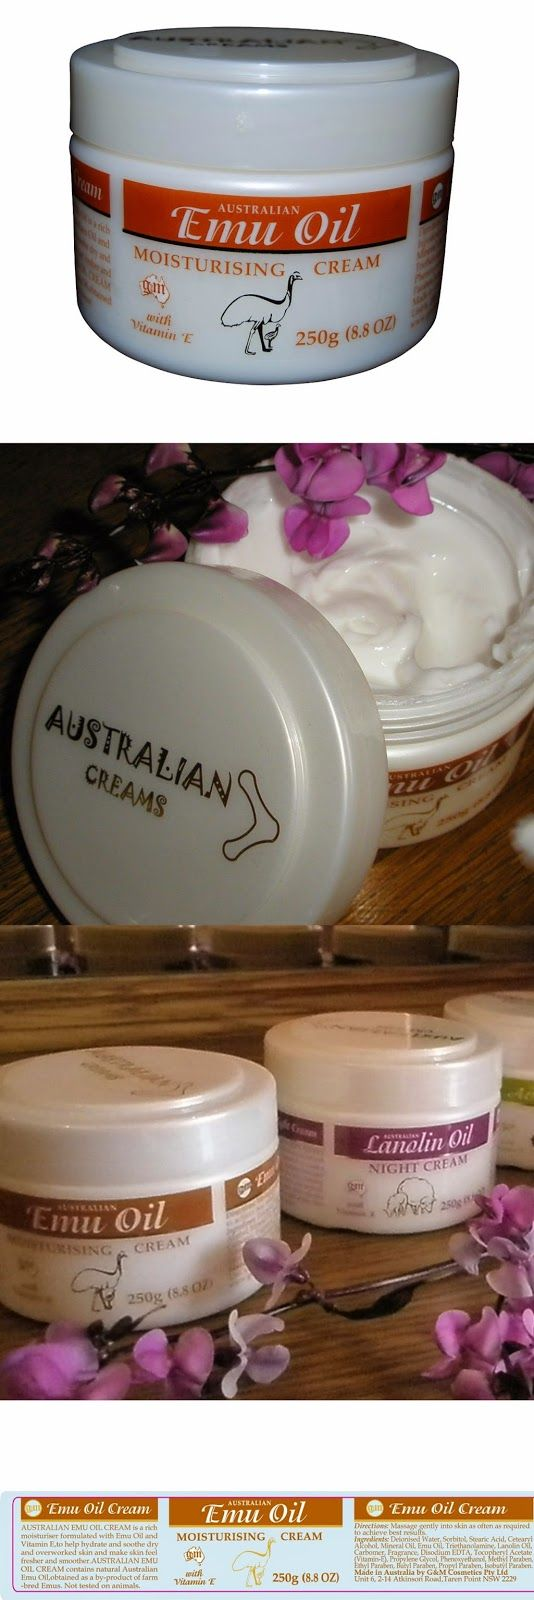 Emu Oil Cream with Vitamin E -Super Strength 8.8 -Ounce $14.99